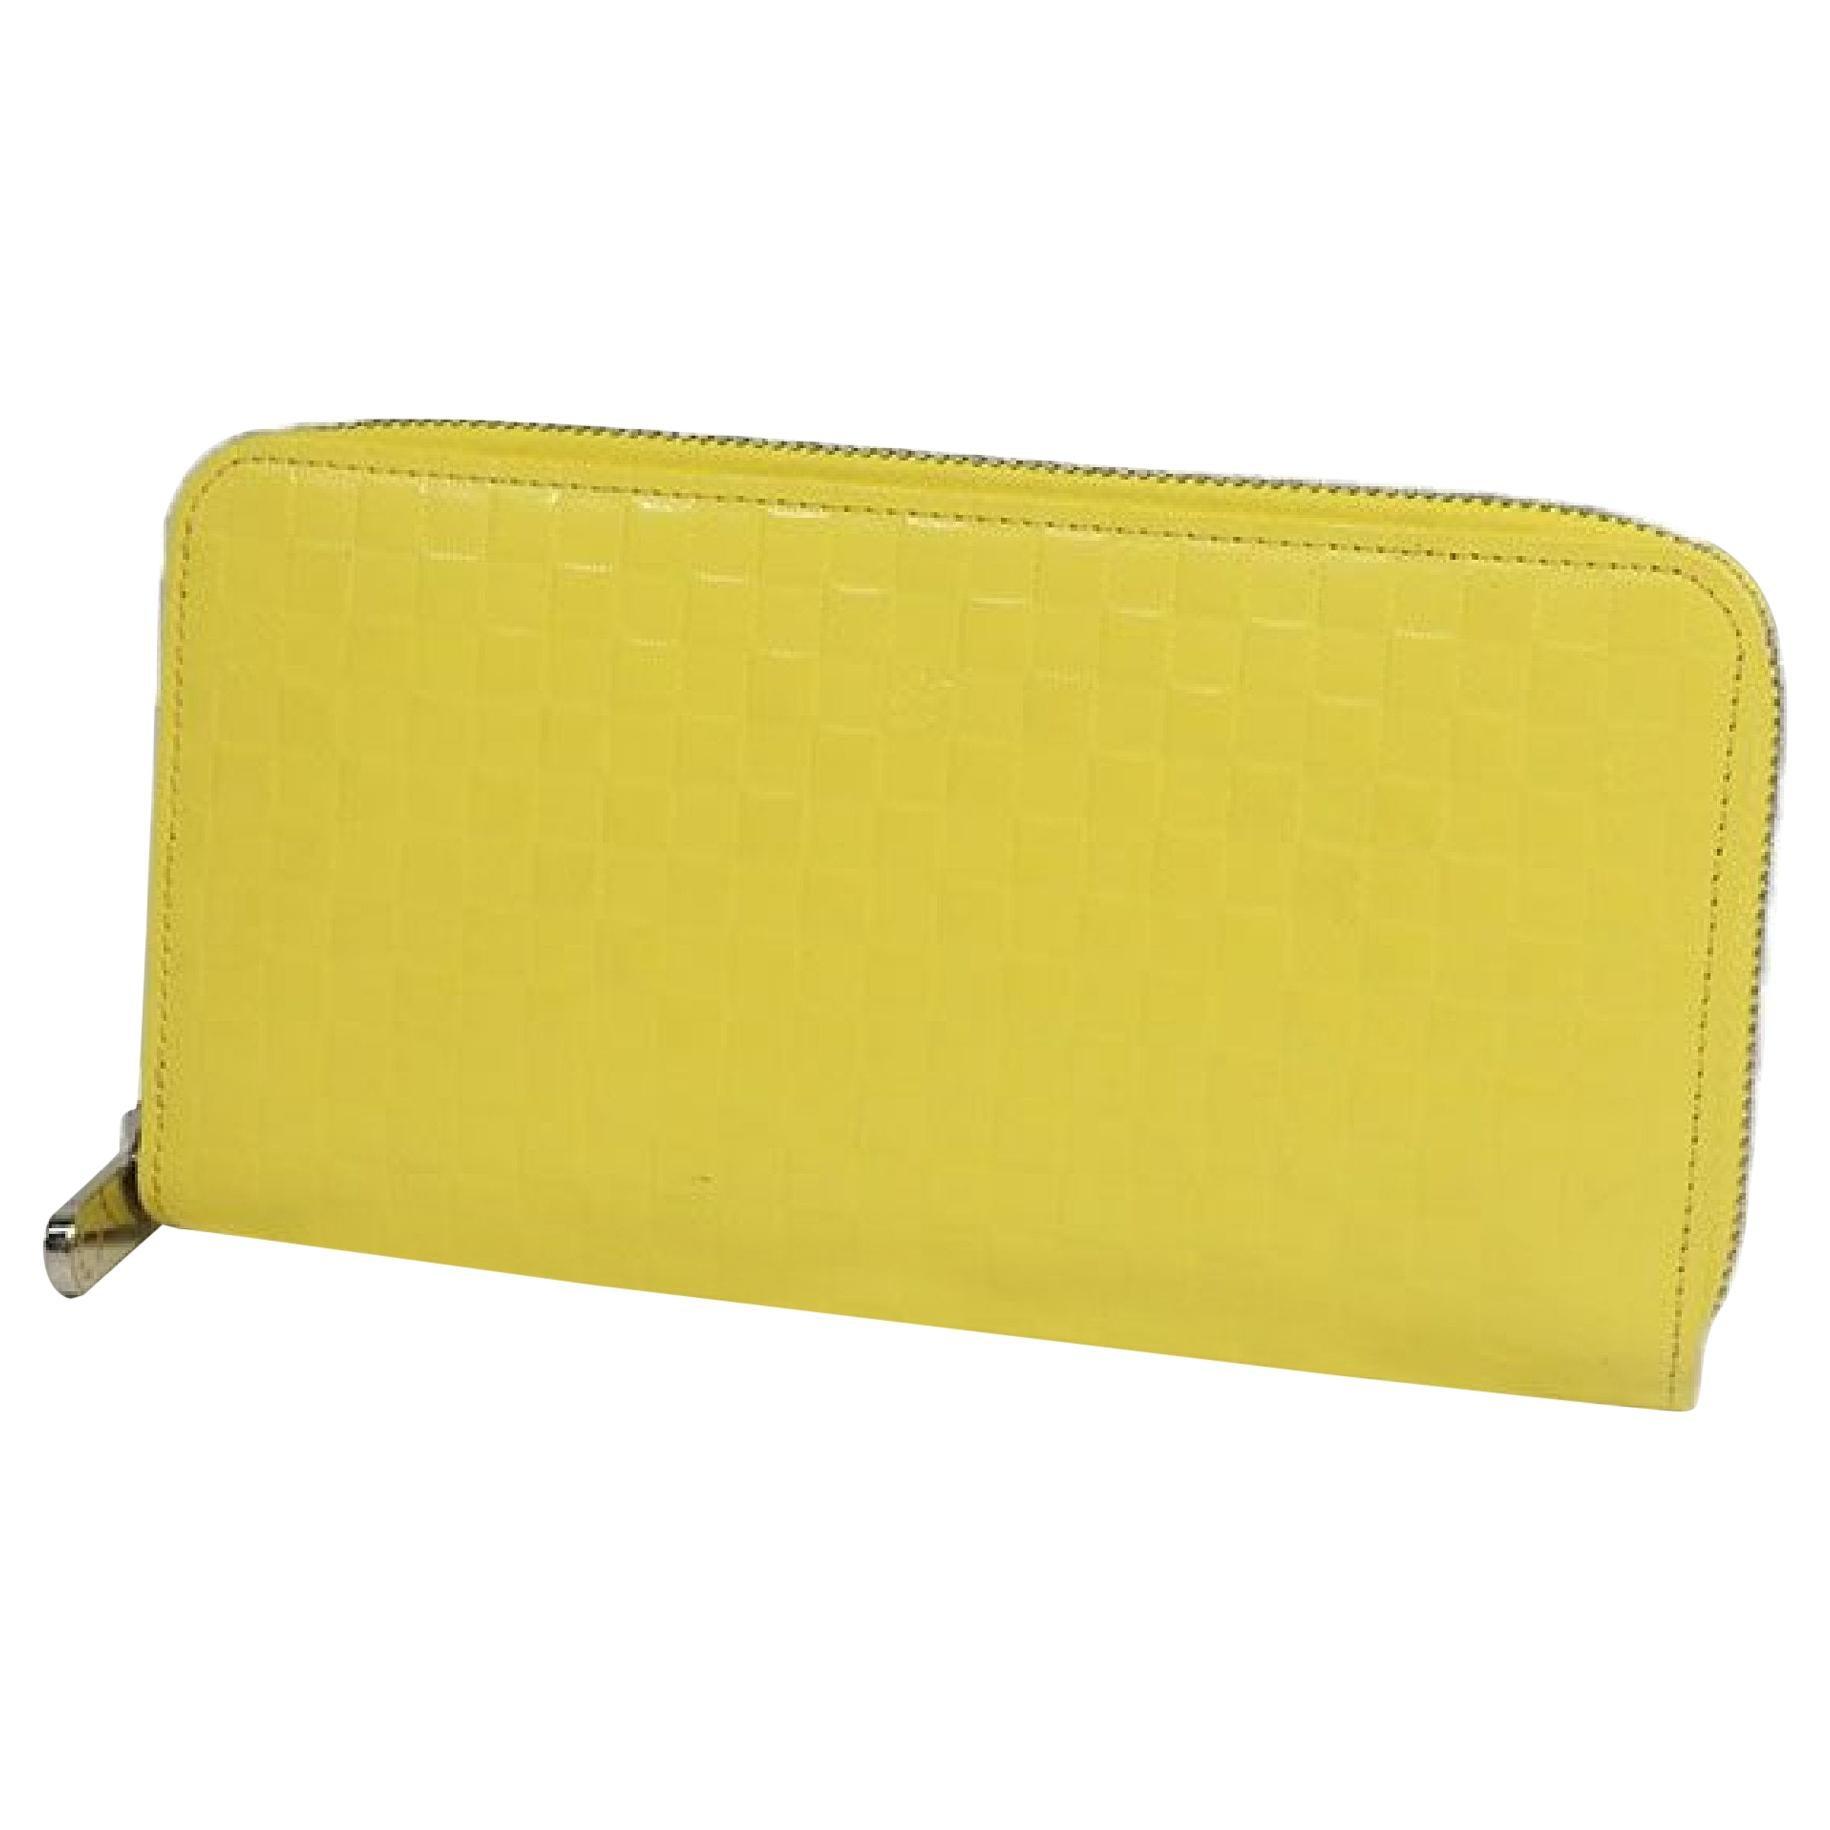 LOUIS VUITTON round zipper Zippy Wallet unisex long wallet M94401 Jaune